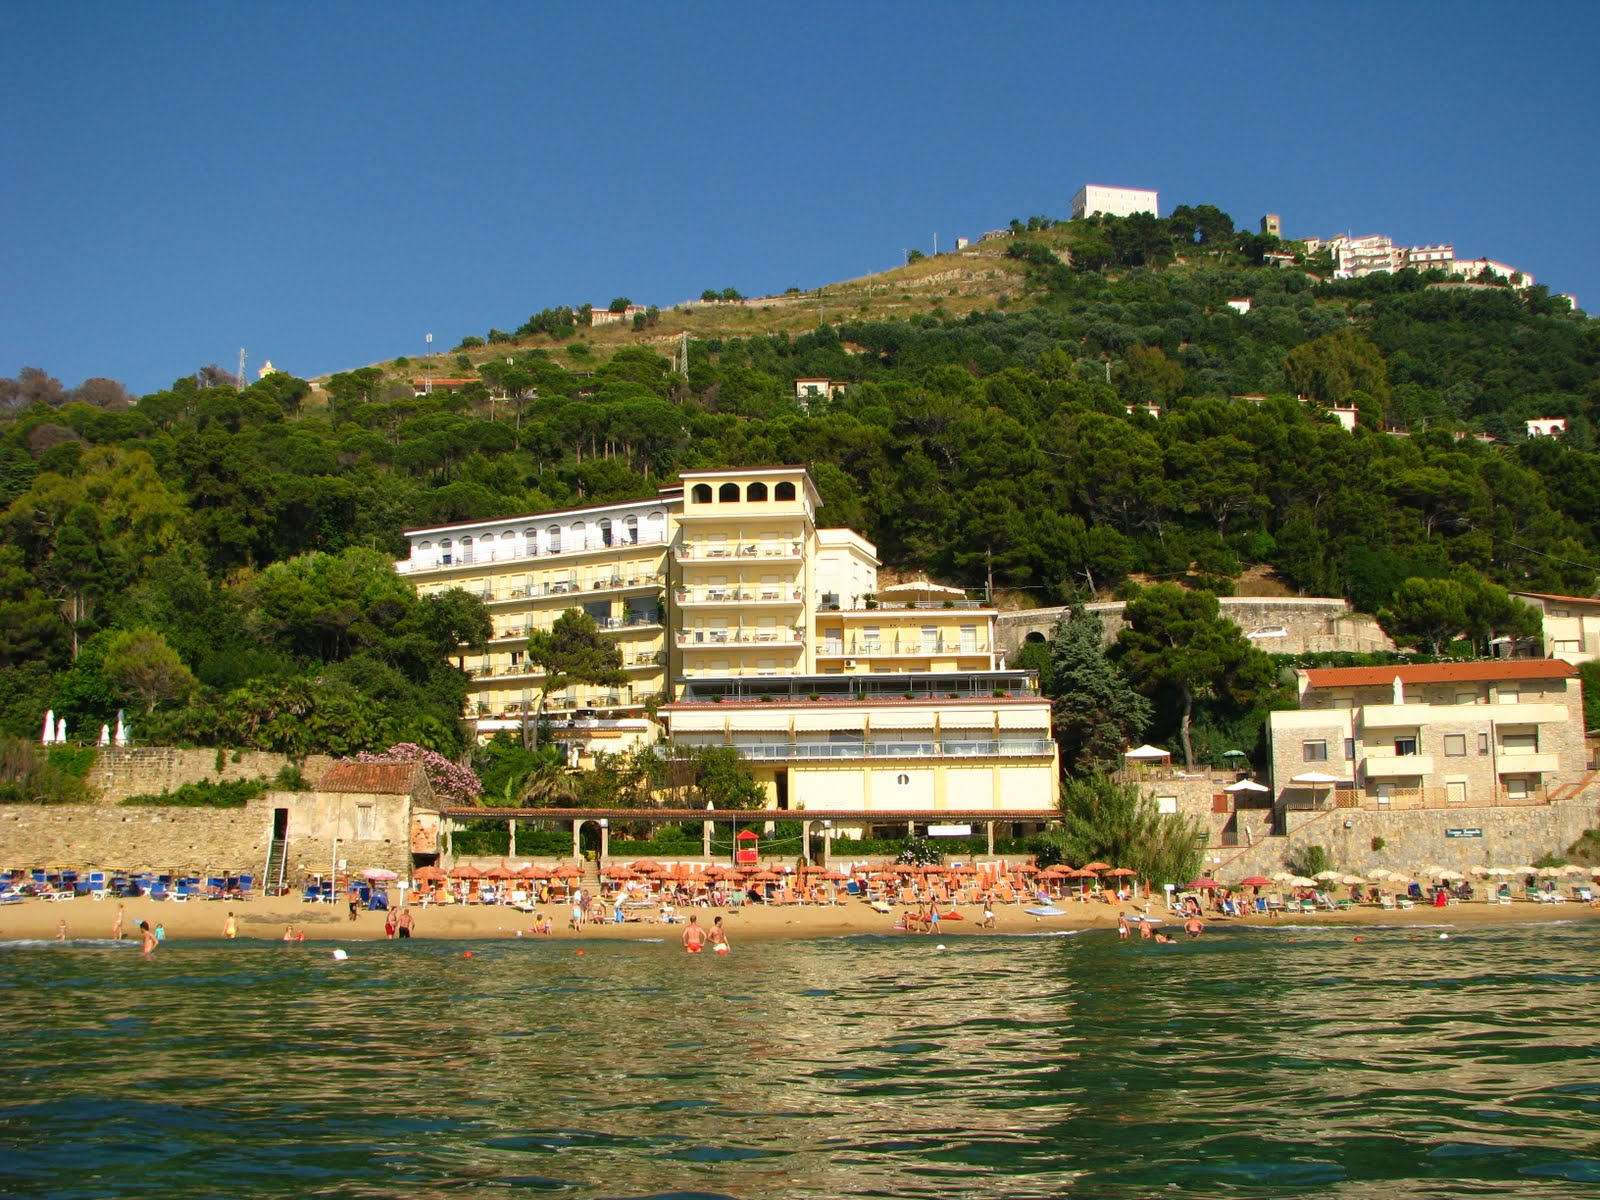 Grand Hotel Santa Maria Castellabate